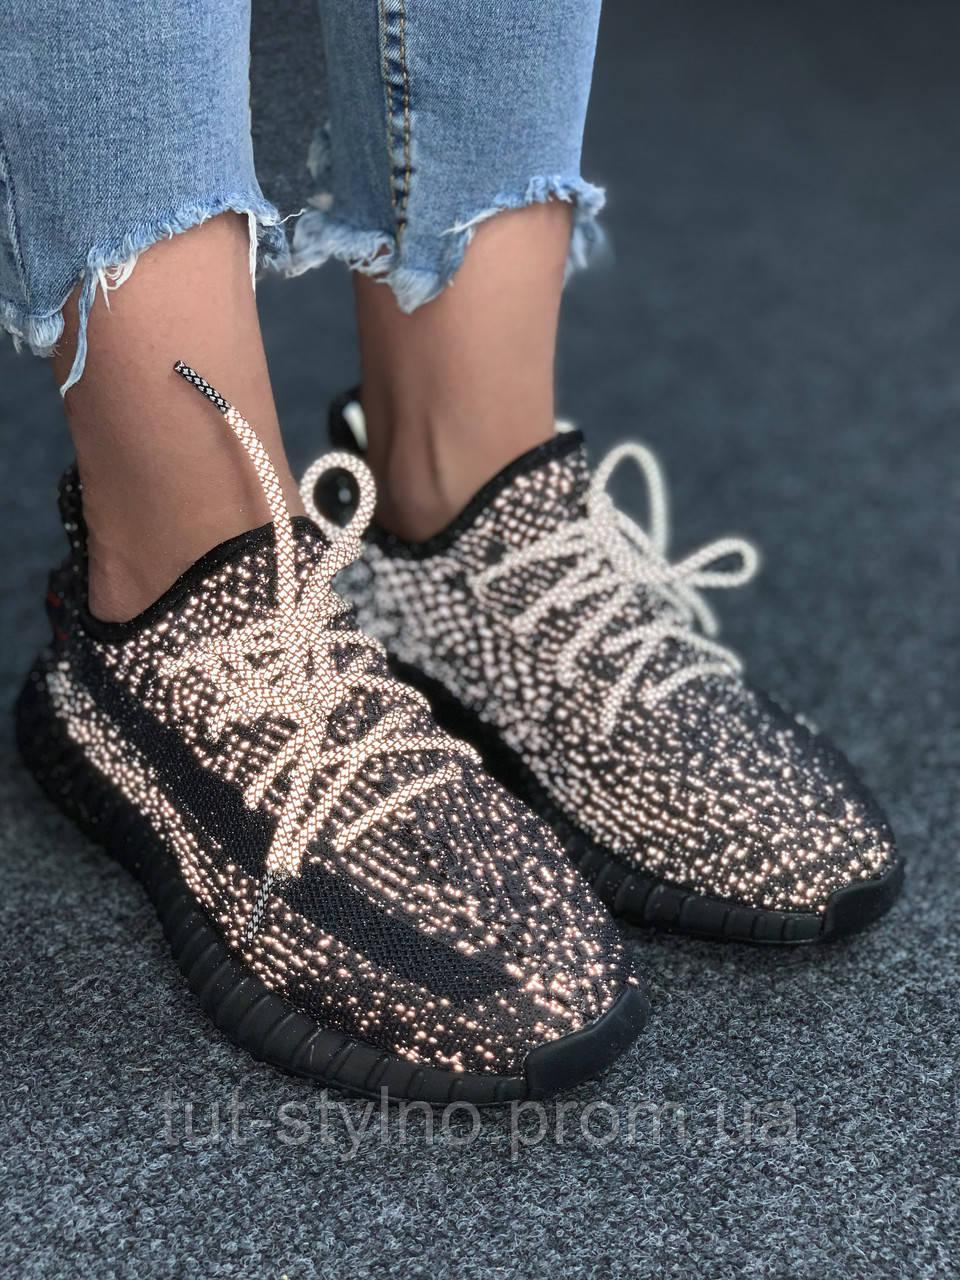 Adidas Yeezy Boost 350 Black (черные) (Full Ref)